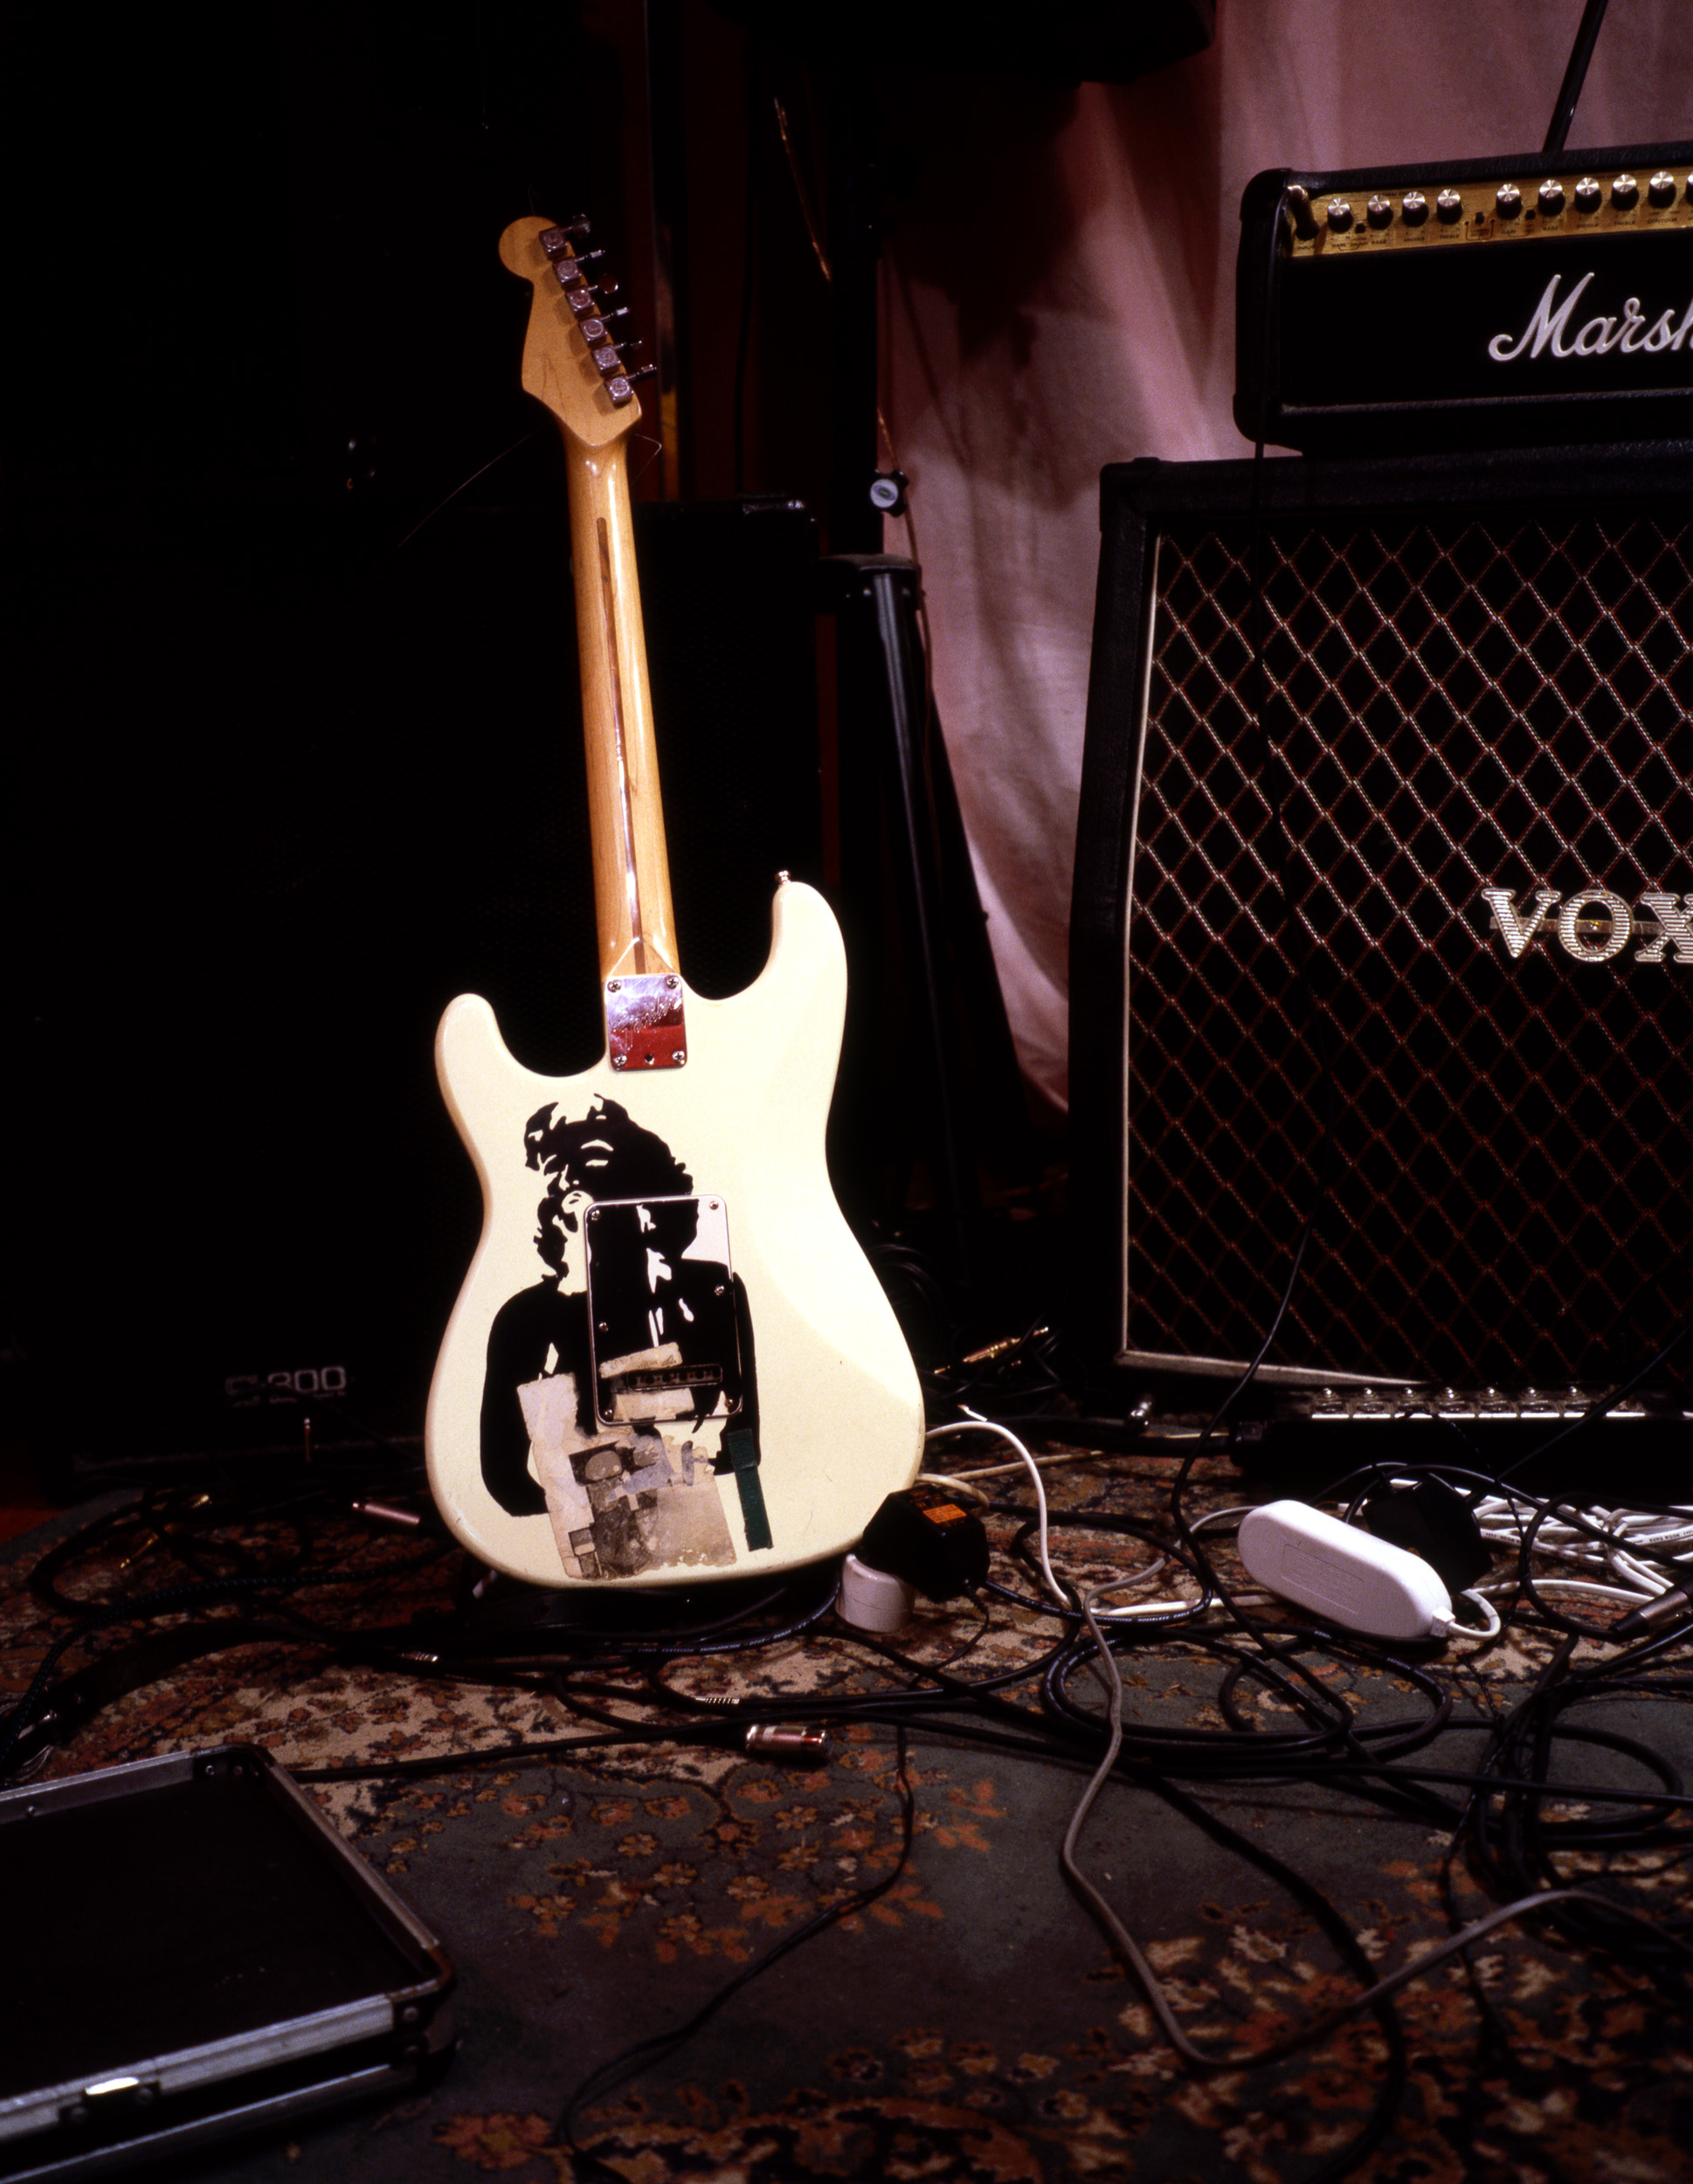 Untitled Production Still (Guitar Vox)  2005, colour photograph 76 x 58 cm / 30 x 23 in.